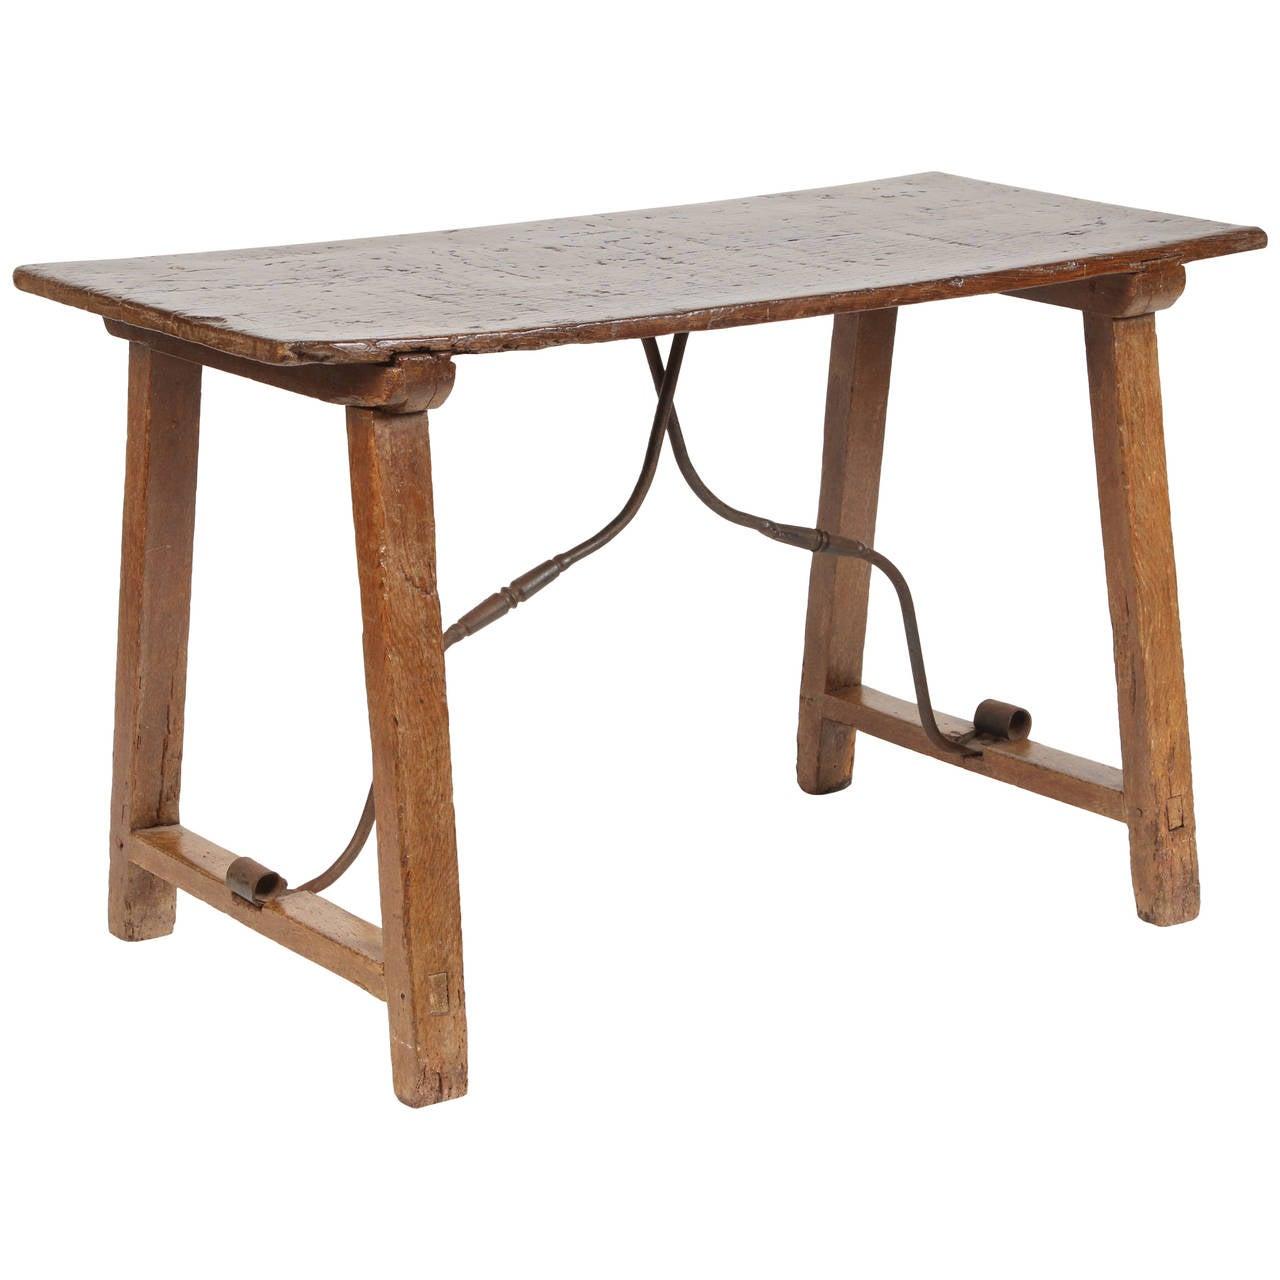 19th Century Spanish Walnut Table